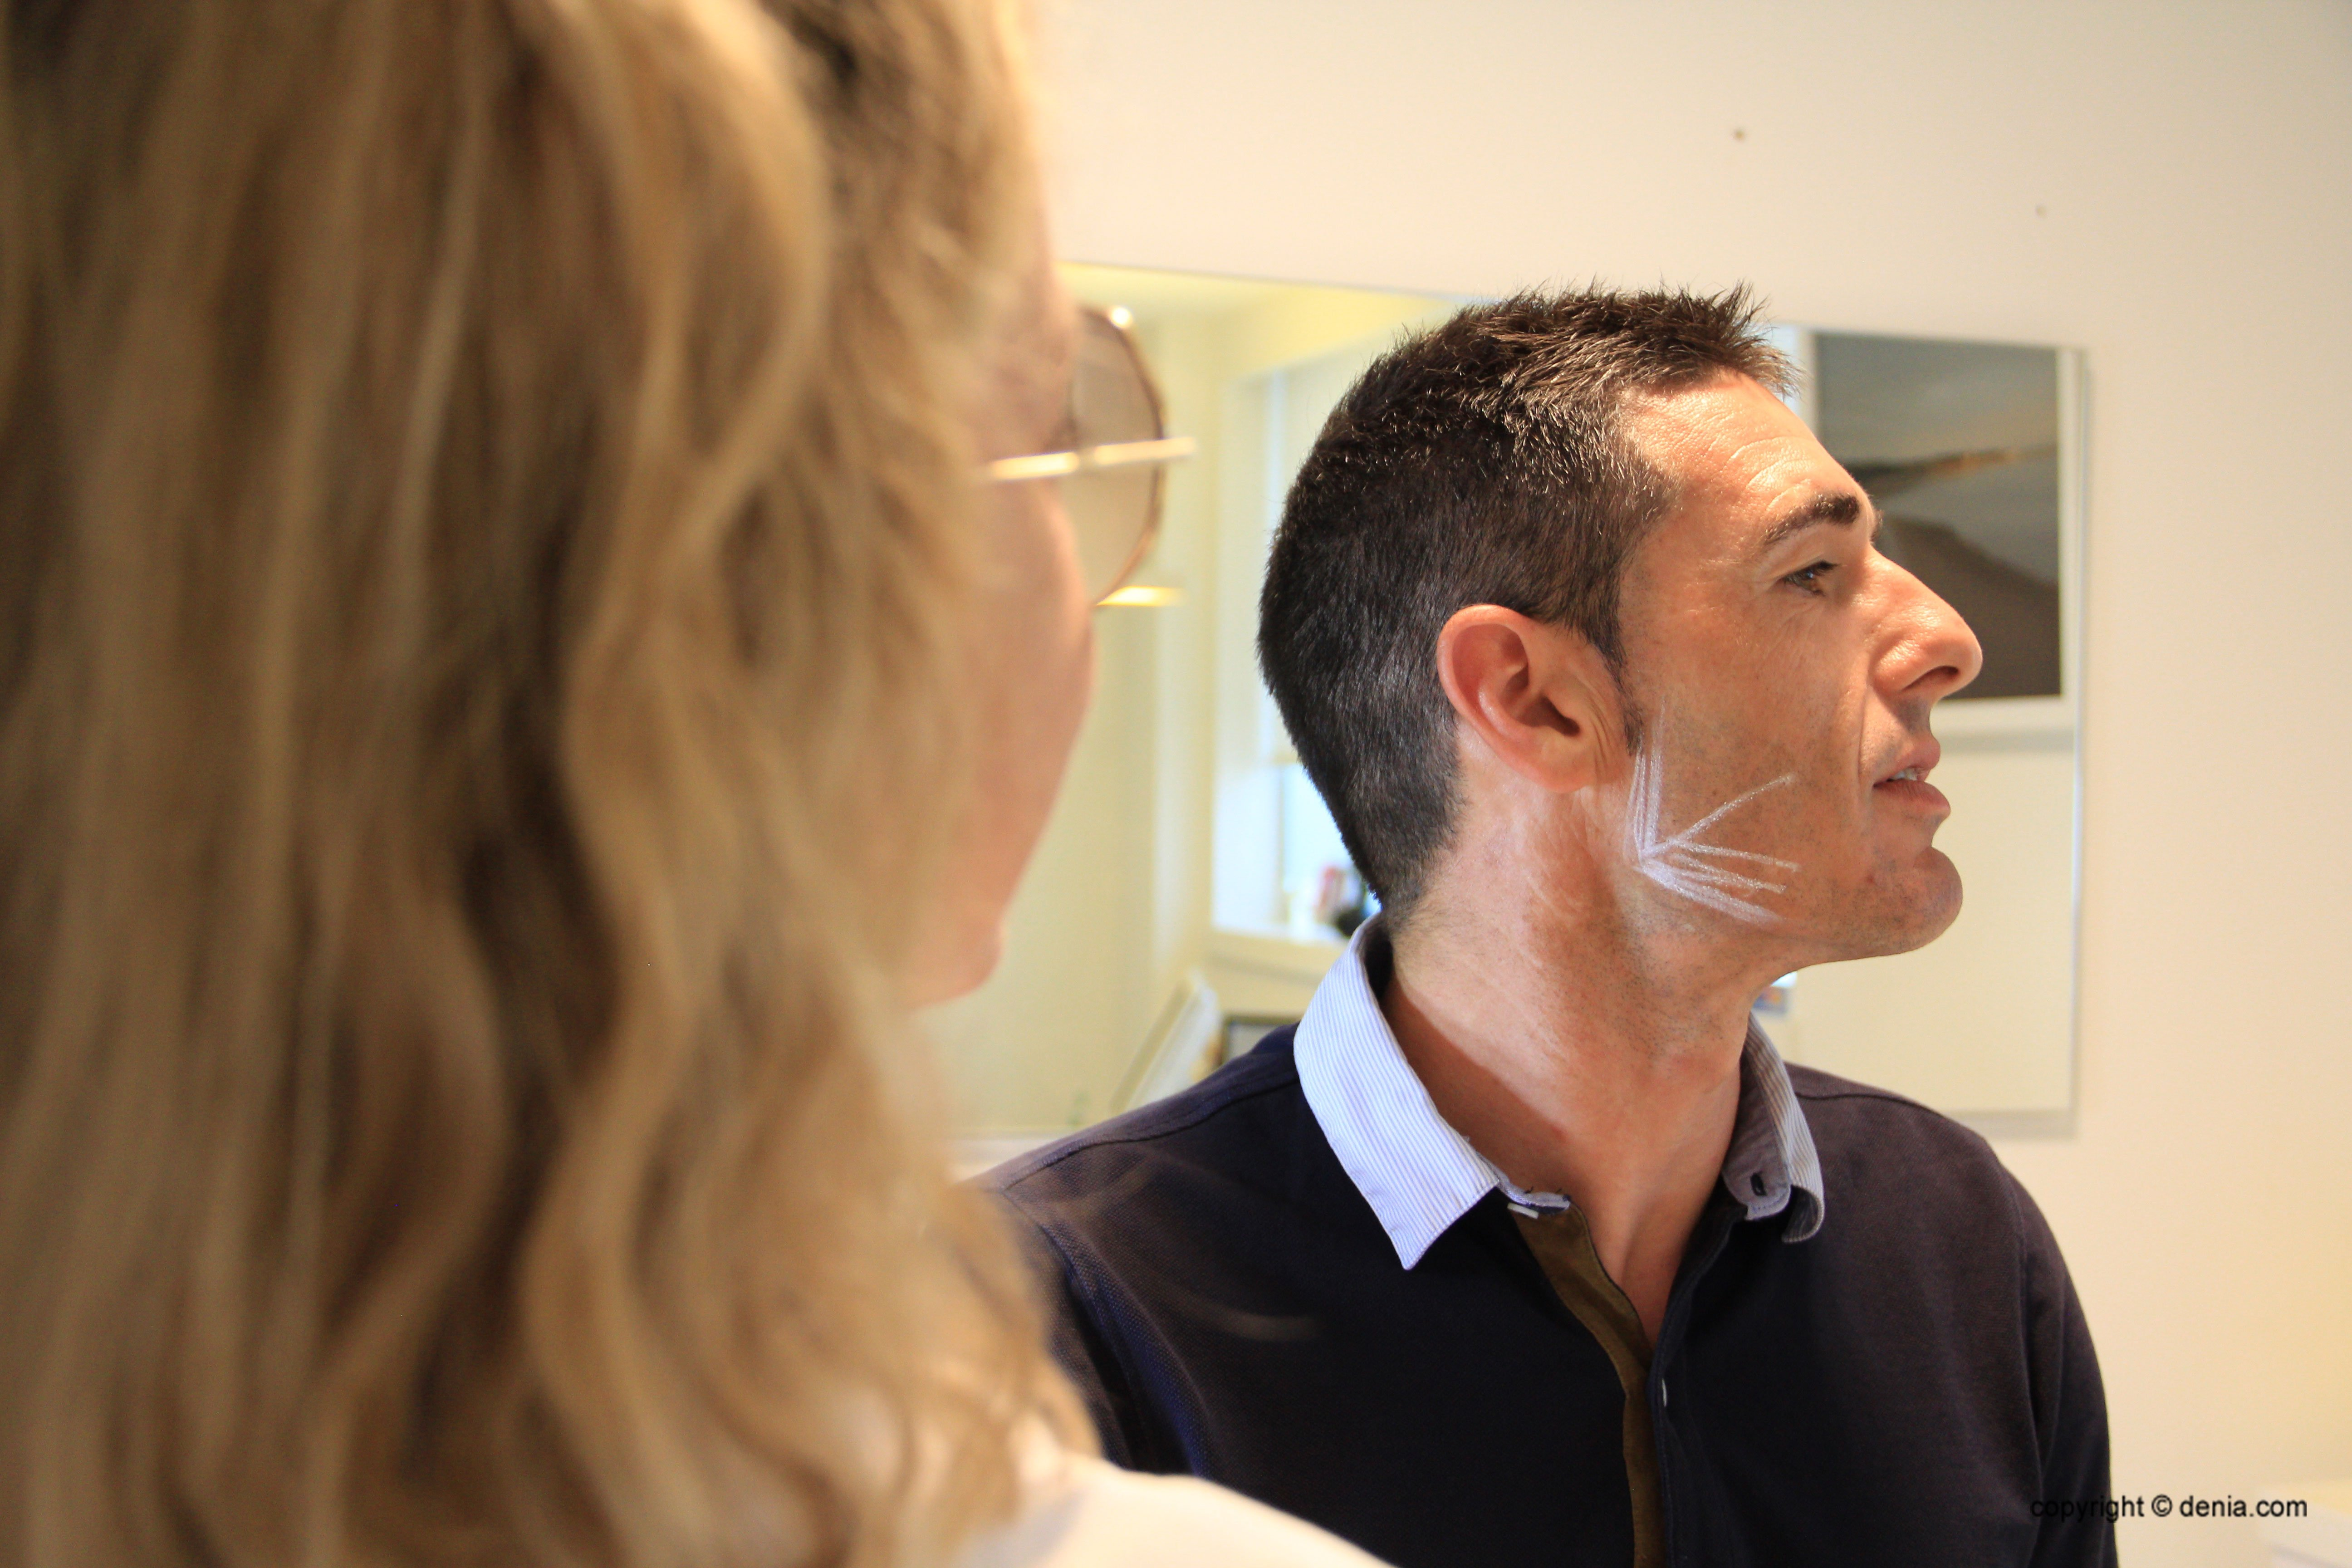 Tratamientos estéticos para hombres en Dénia – Clínica Estética Castelblanque